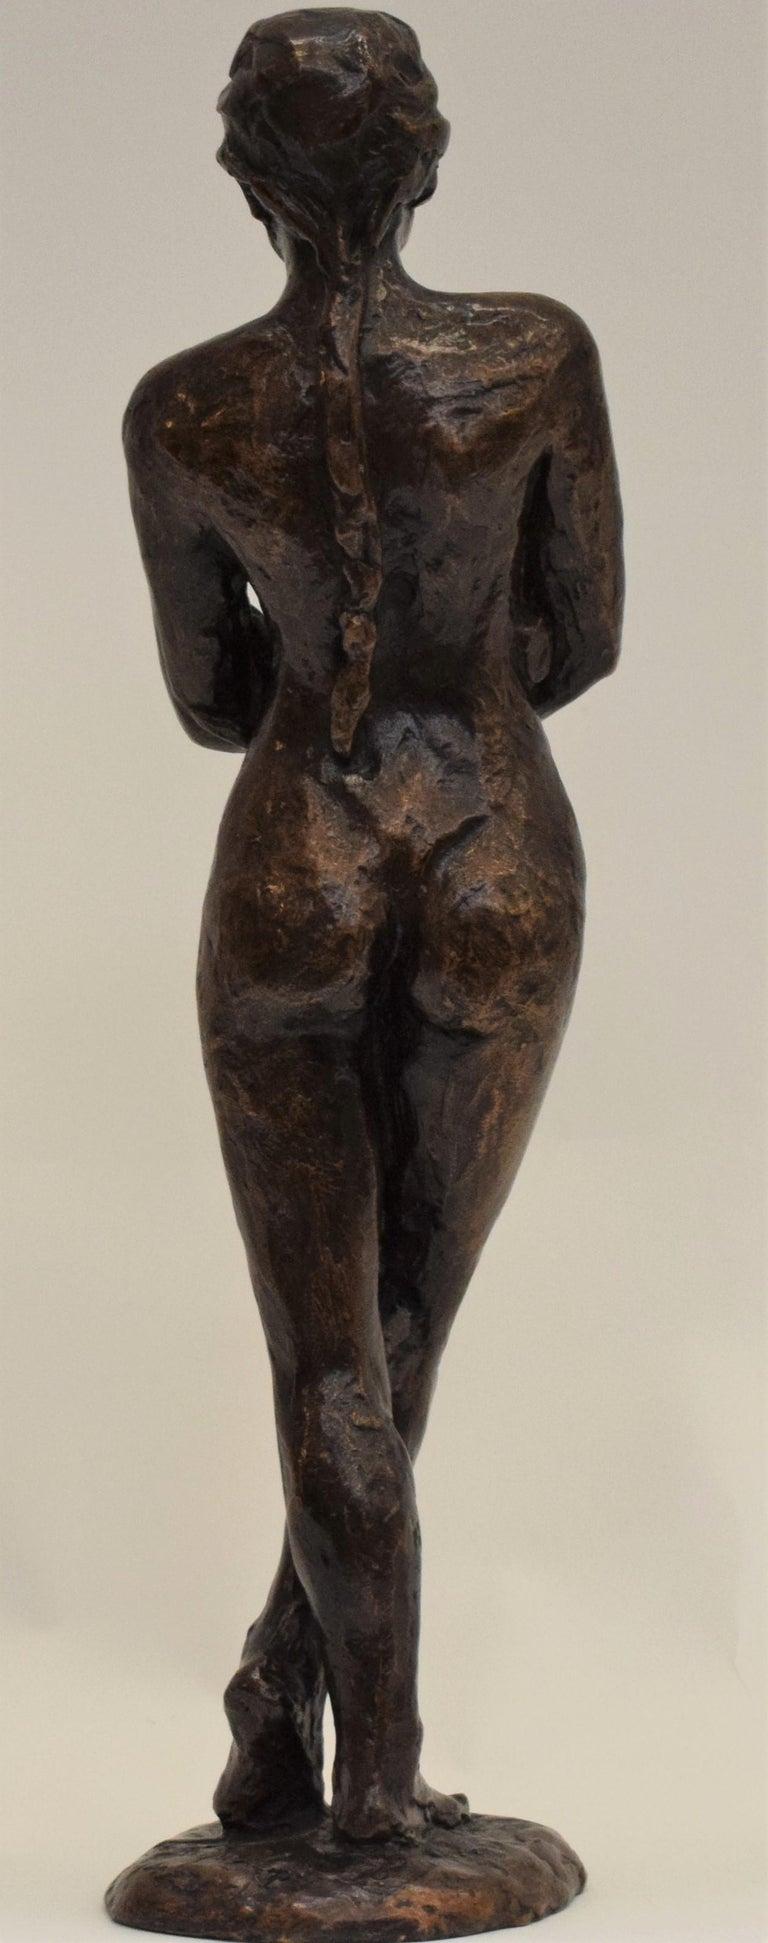 Bronze statue of a woman, Anneke Hei - Degenhardt (1951), Signed - Gold Nude Sculpture by Anneke Hei-Degenhardt